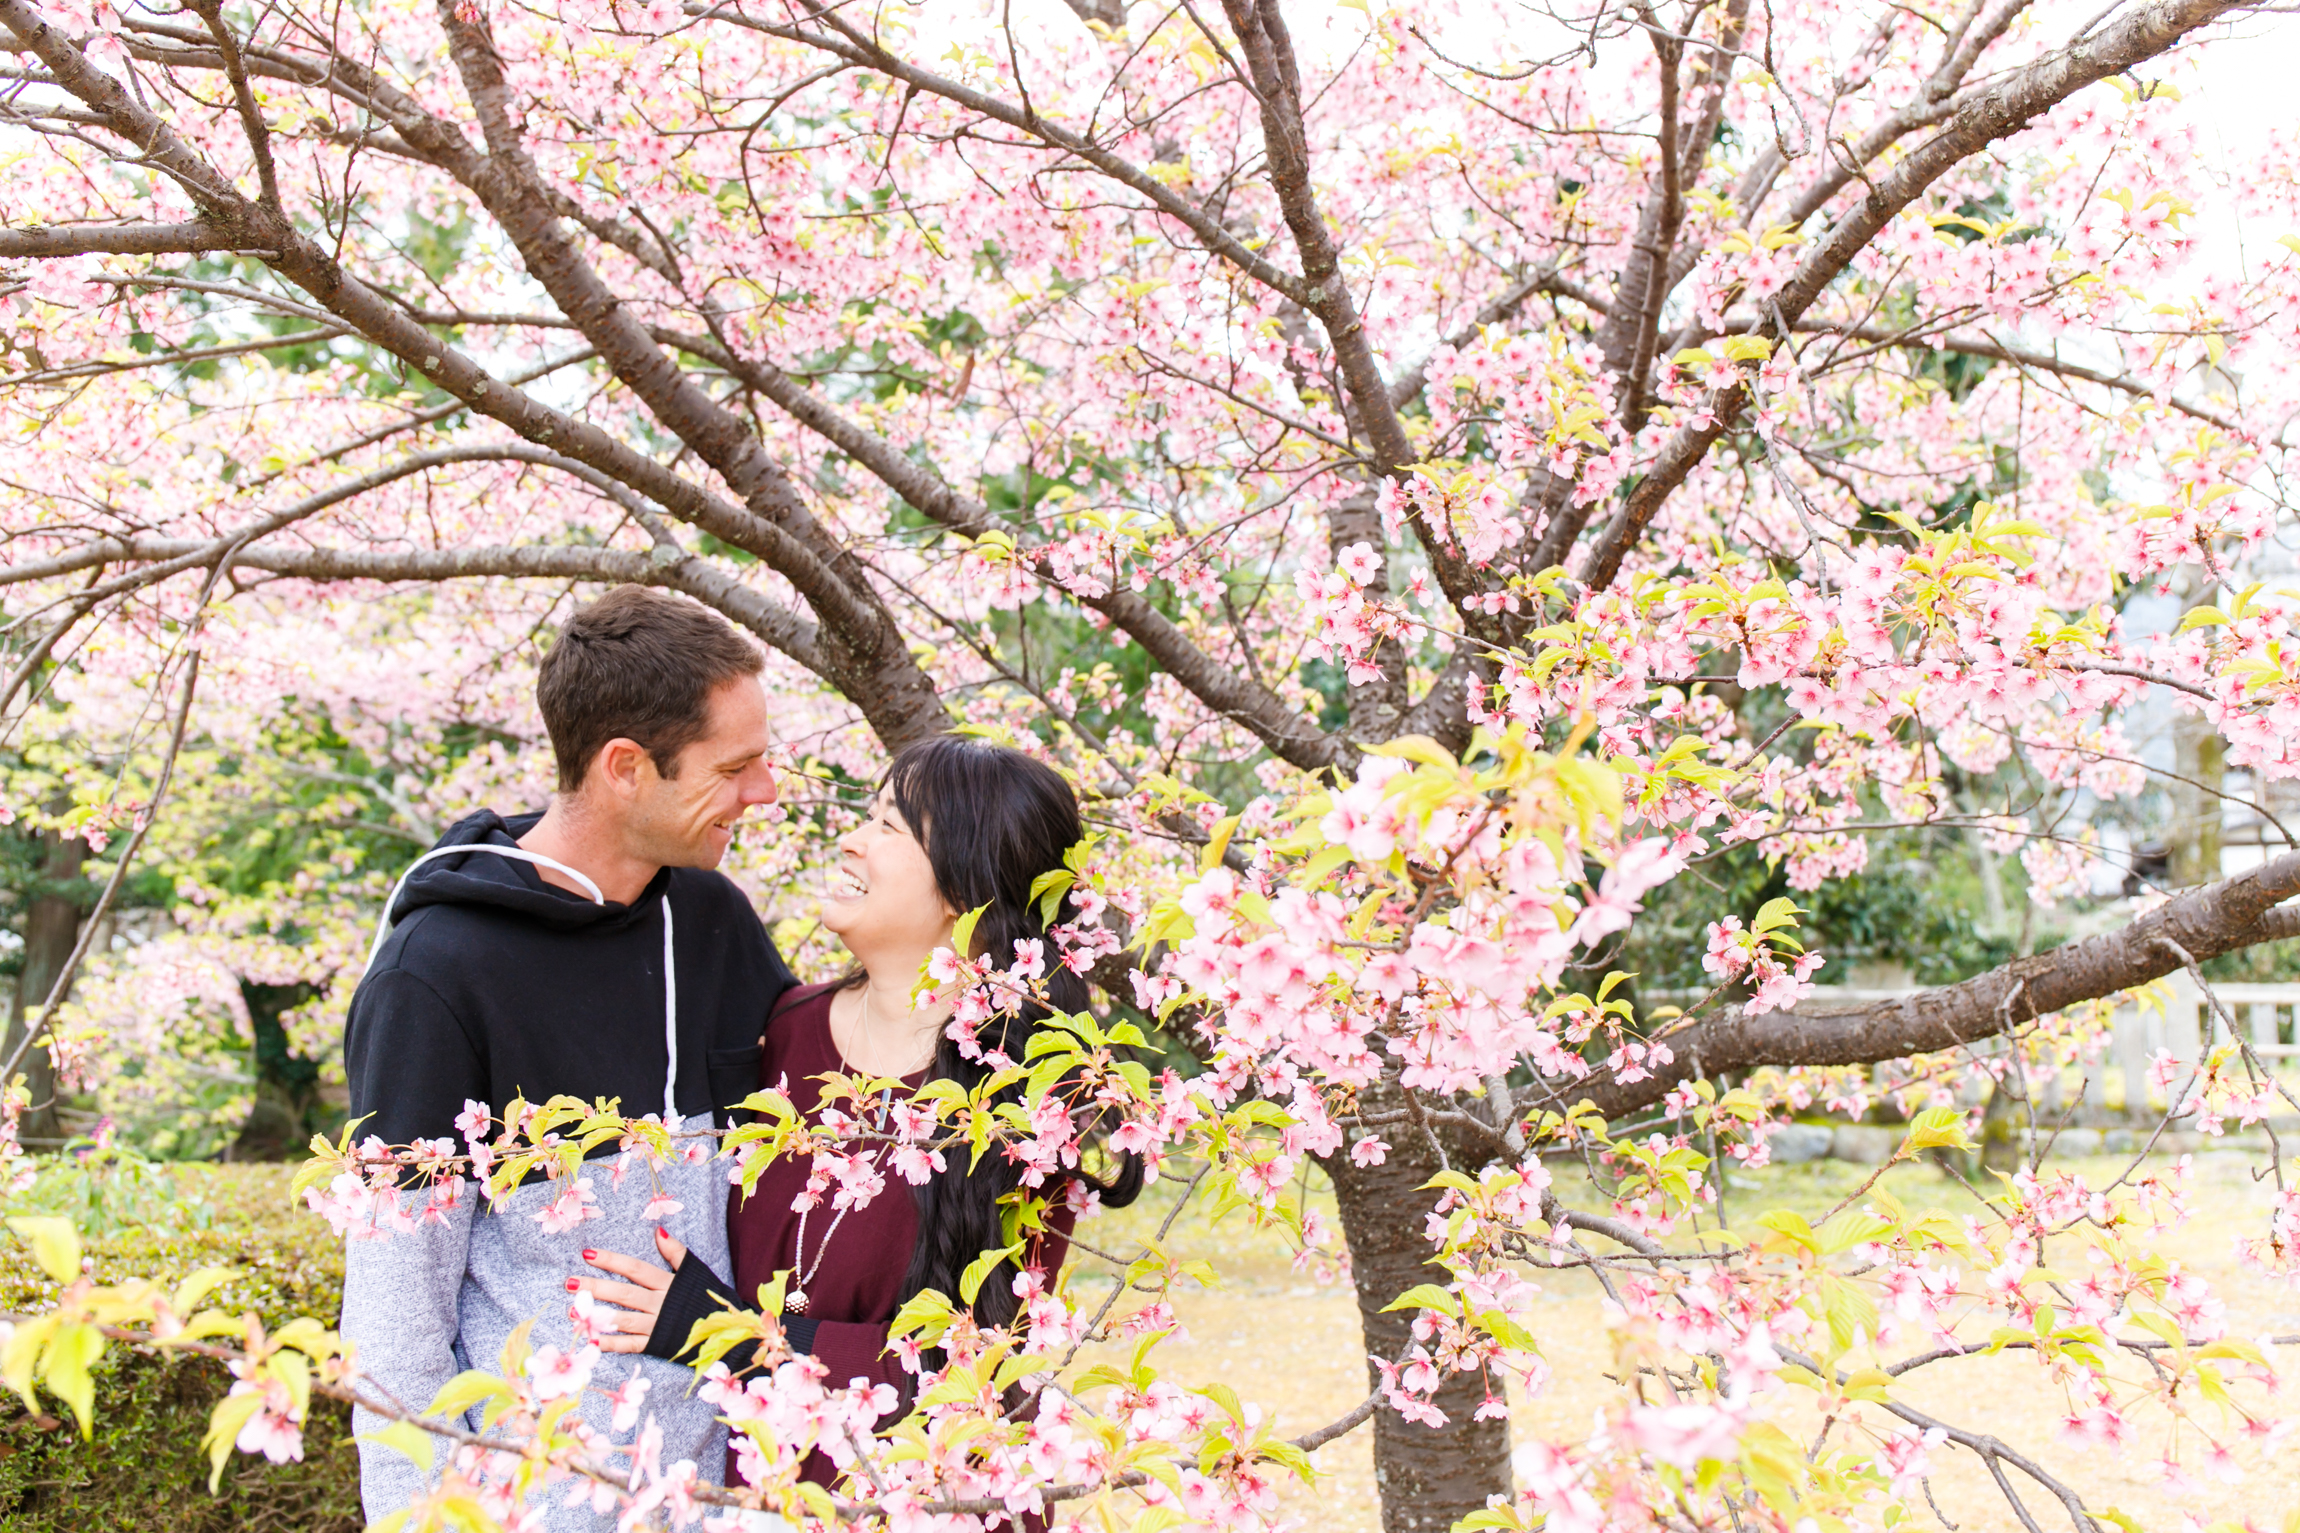 Photoshooting tour in Osaka, Kyoto and Tokyo